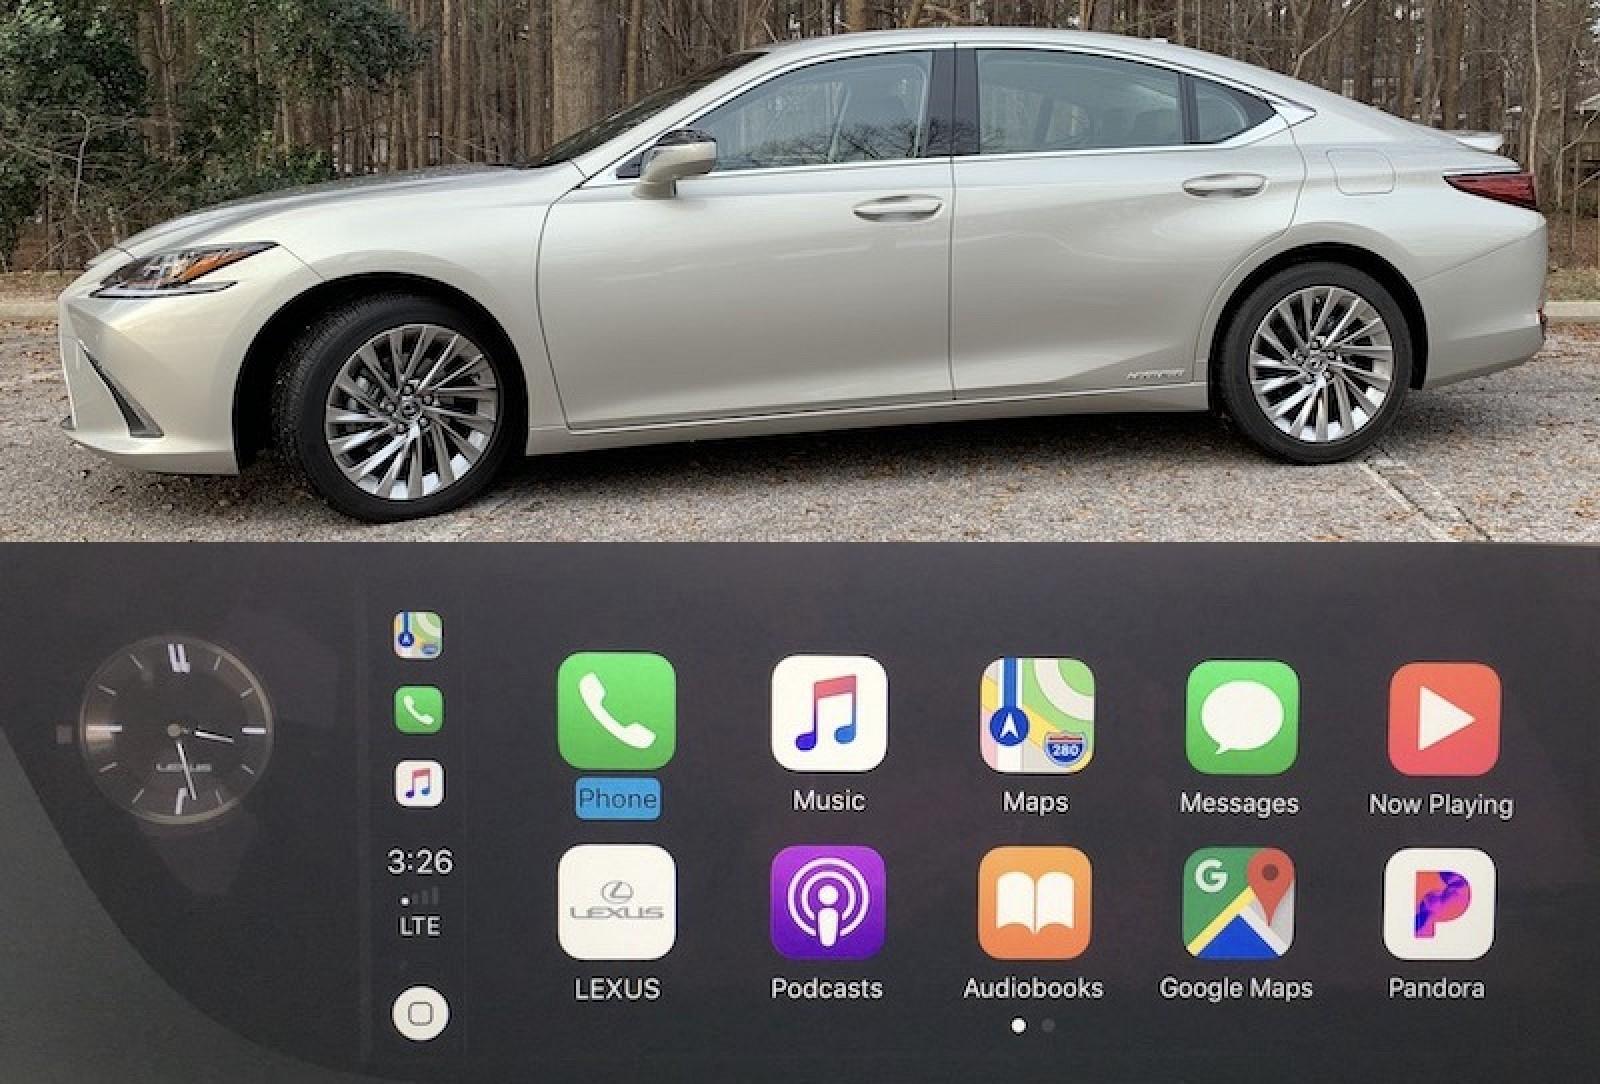 Review 2019 Lexus Es Features Optional Widescreen Carplay But